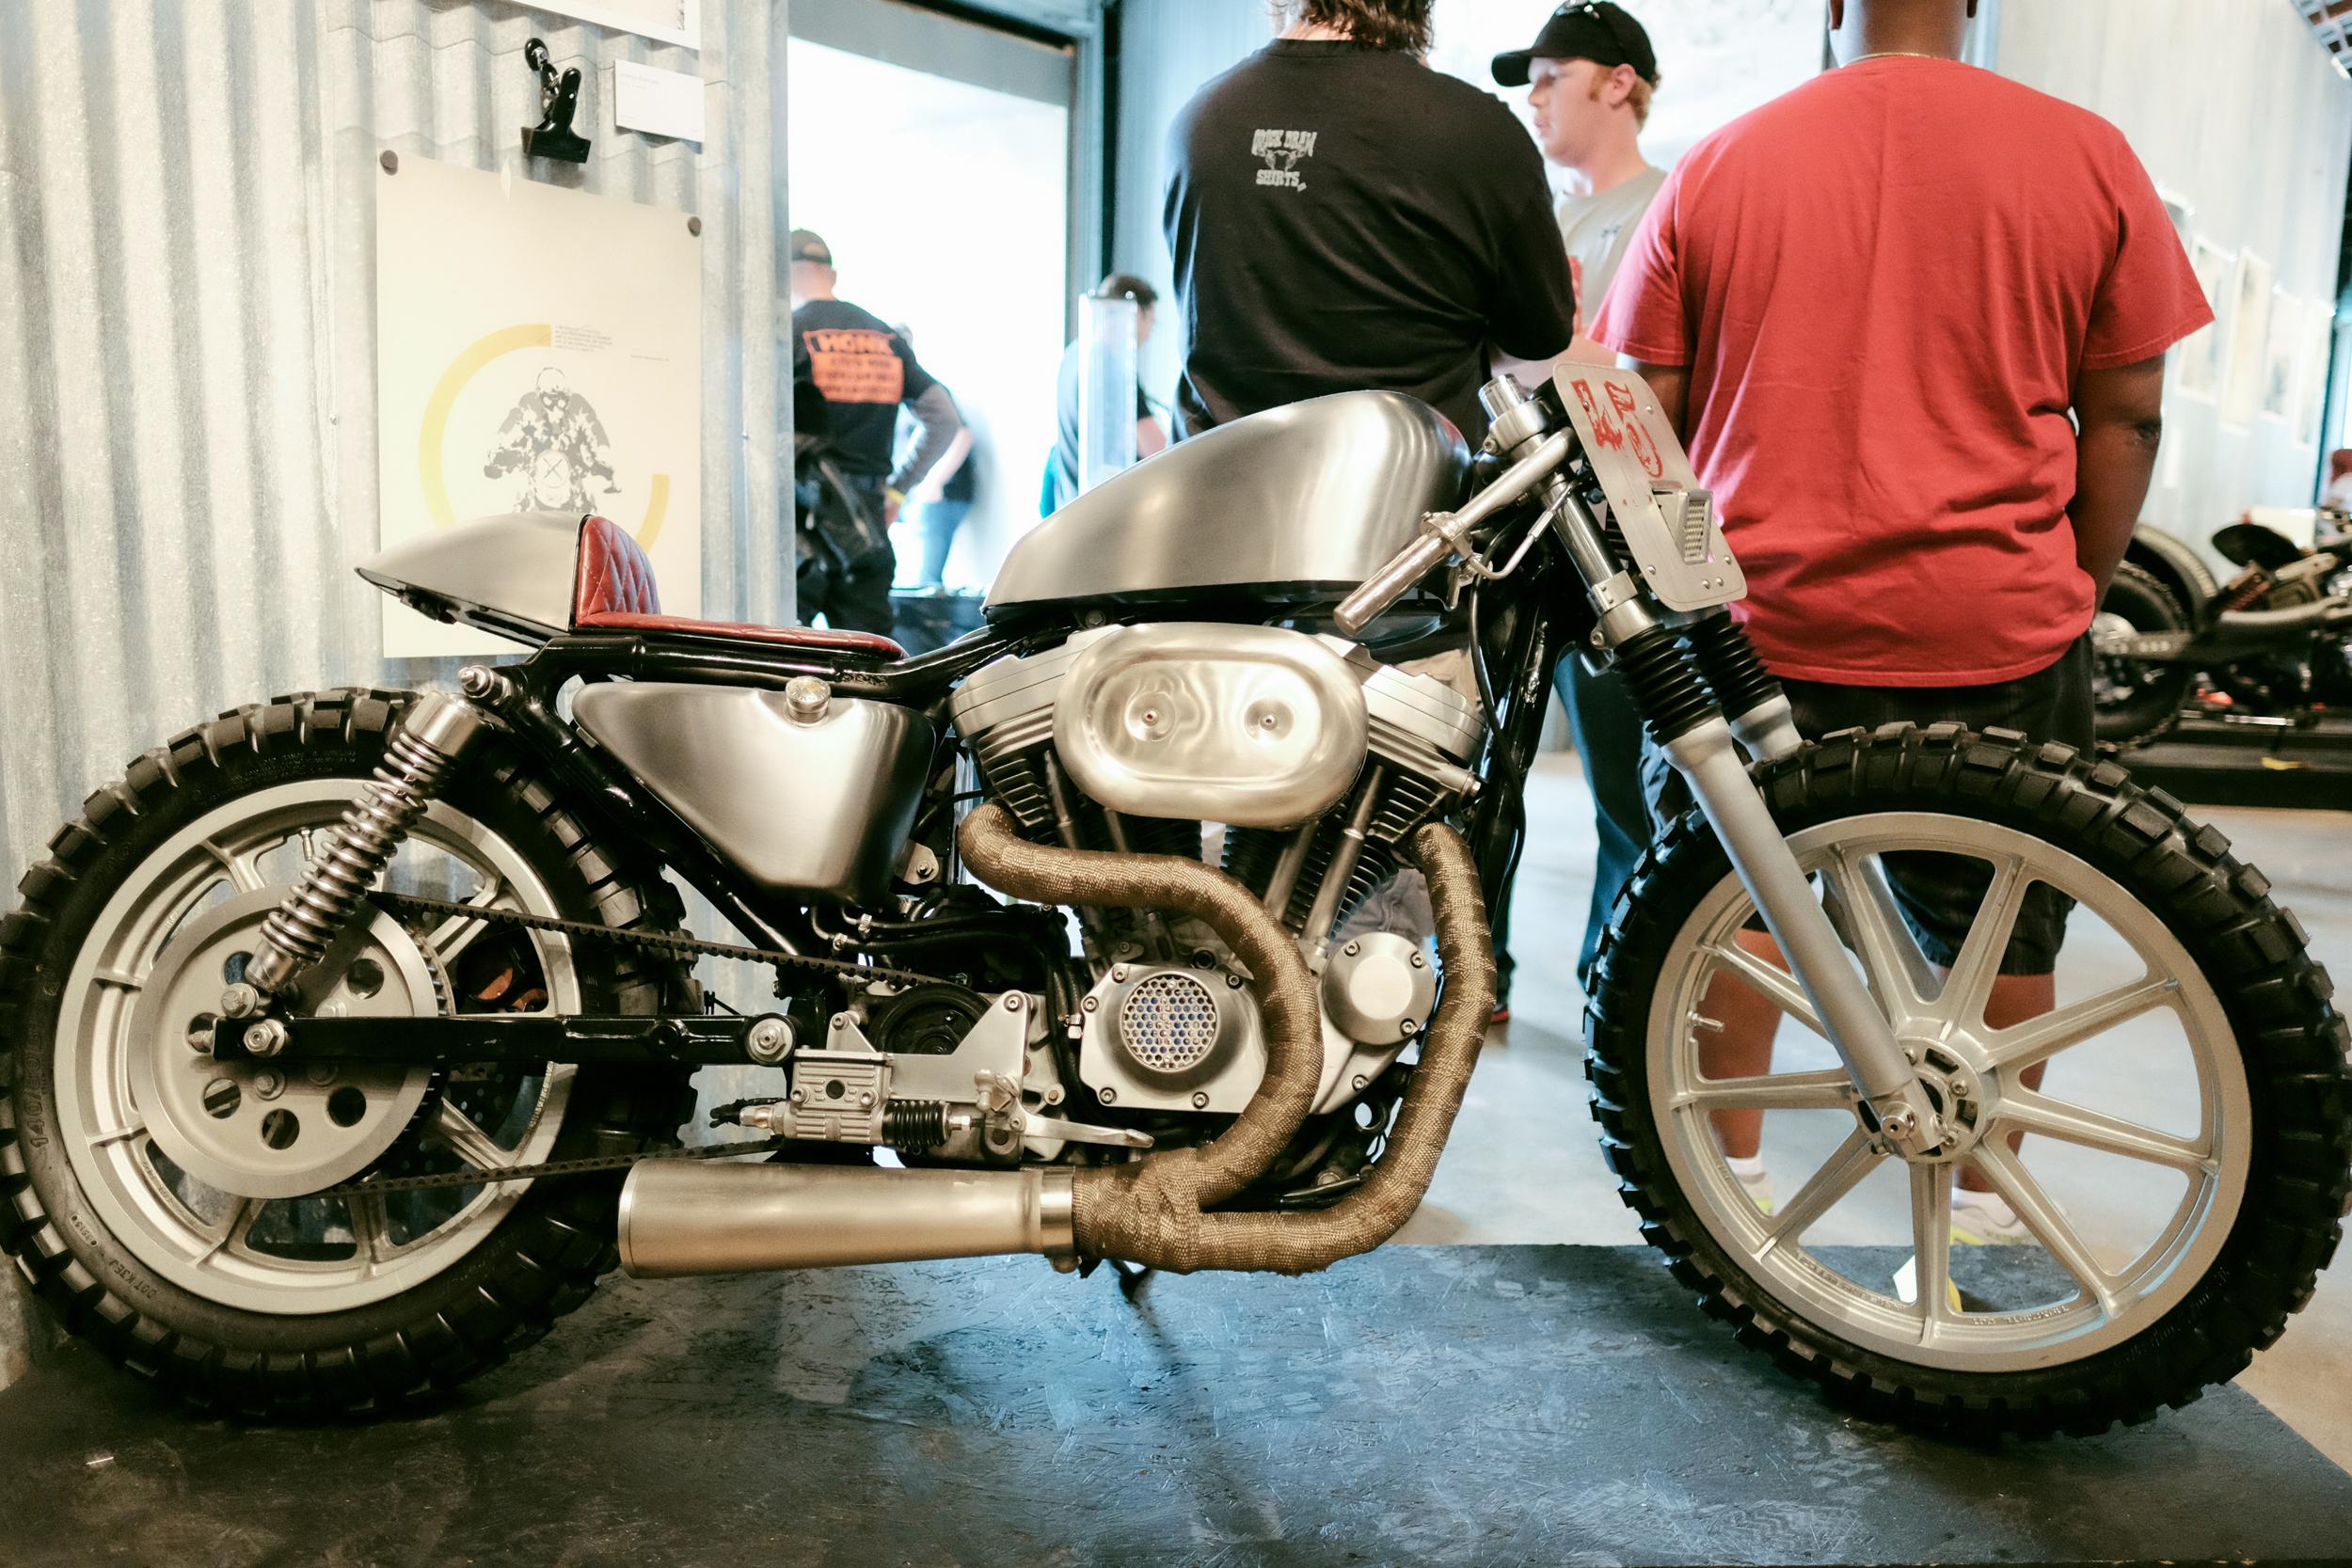 handbuilt-motorcycle-show-2016-8953.jpg